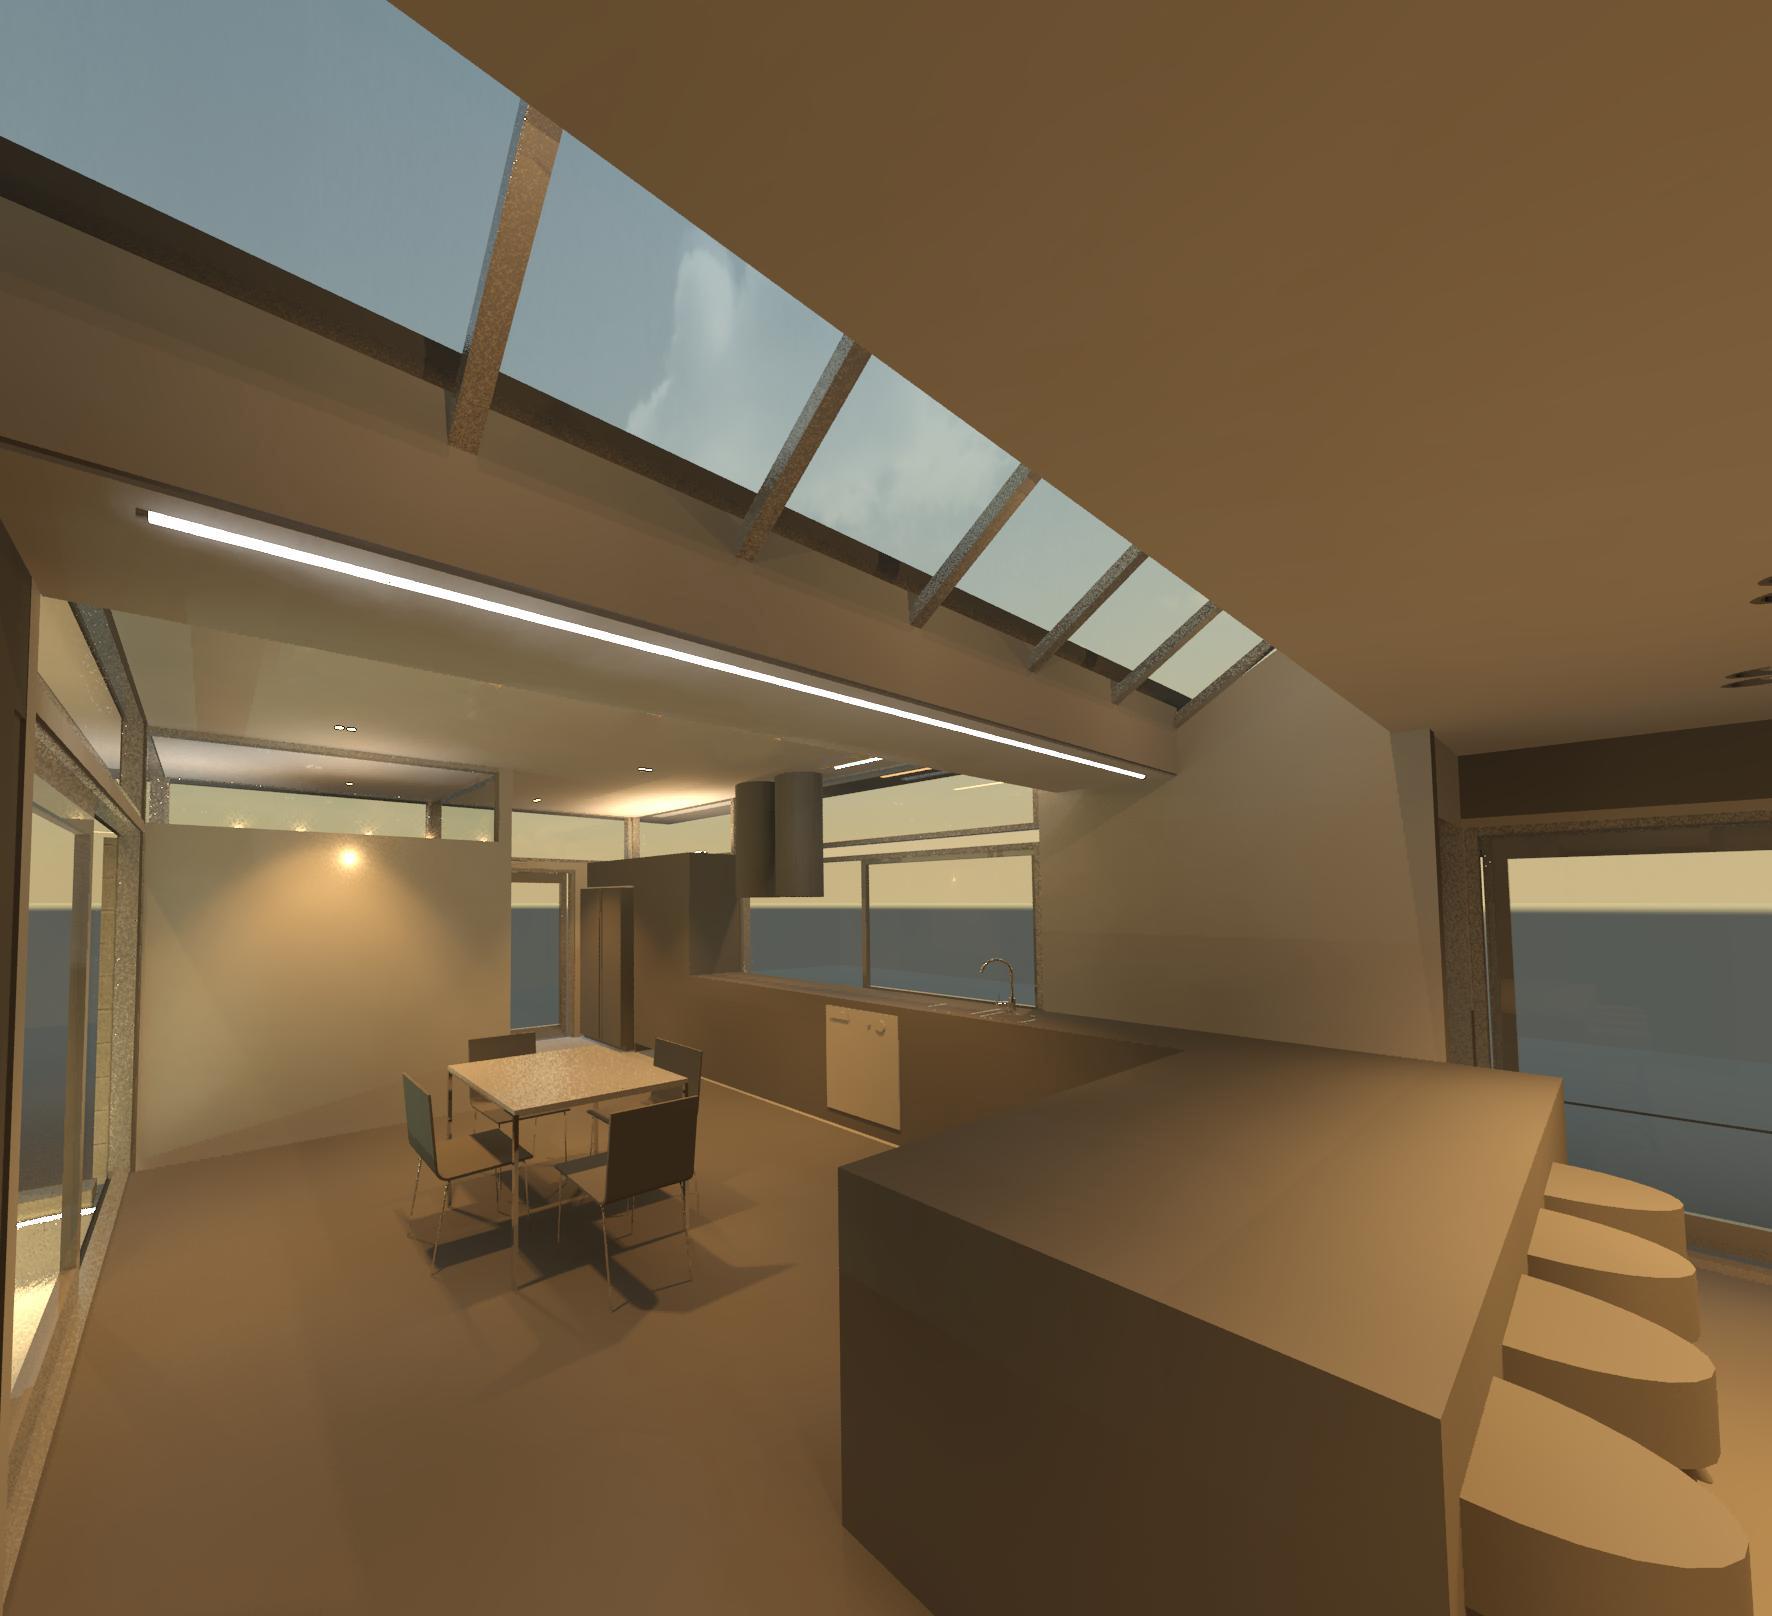 03 view to kitchen skylight (2-2).jpg